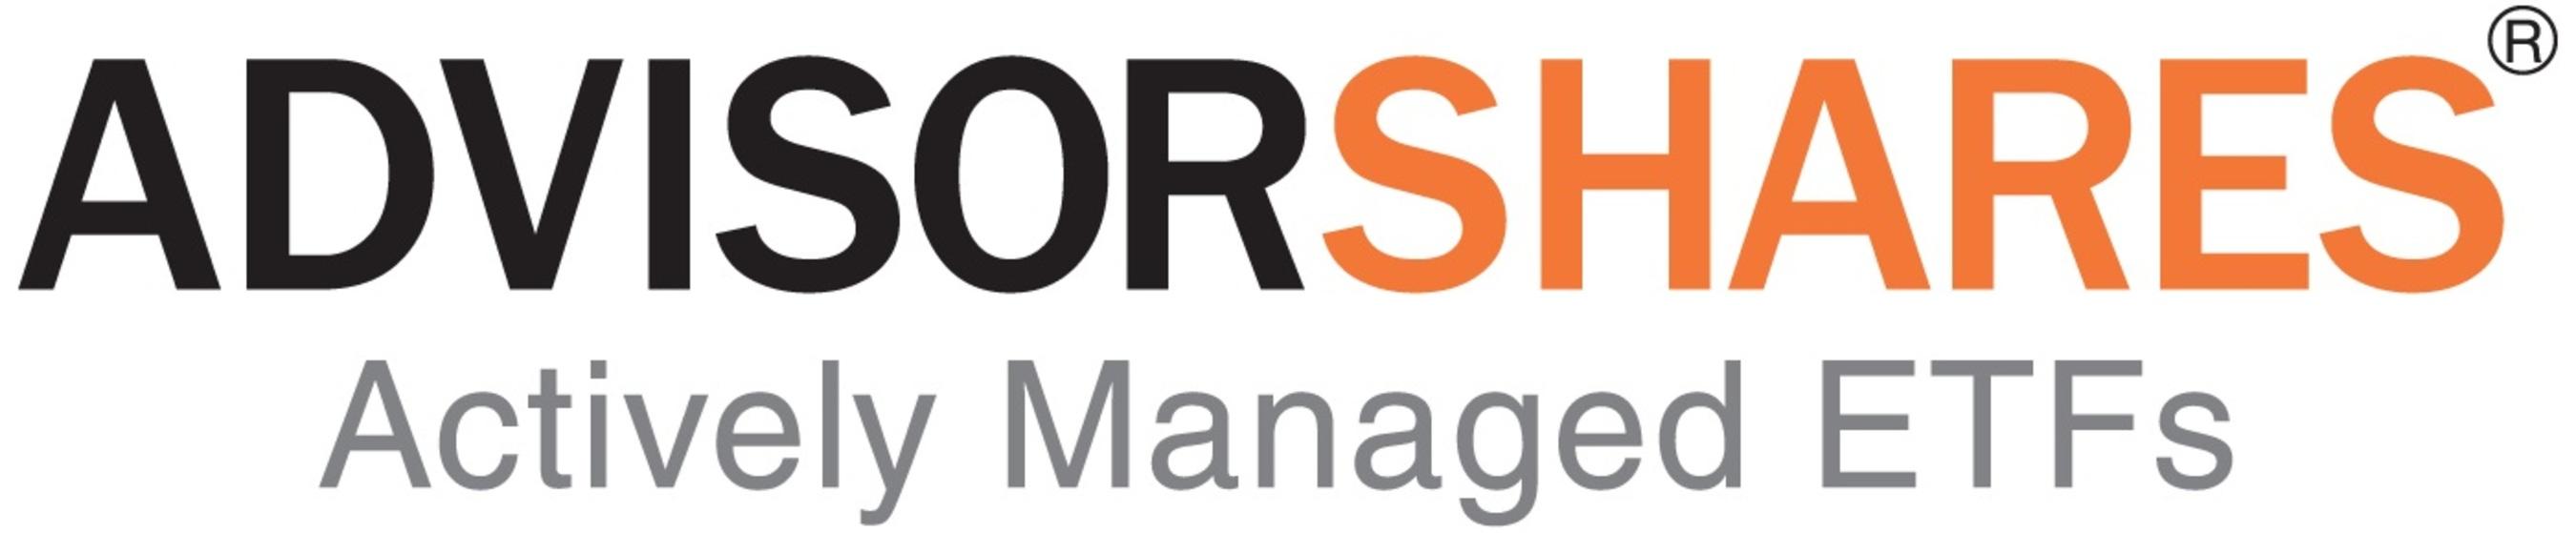 AdvisorShares logo. (PRNewsFoto/AdvisorShares) (PRNewsFoto/)